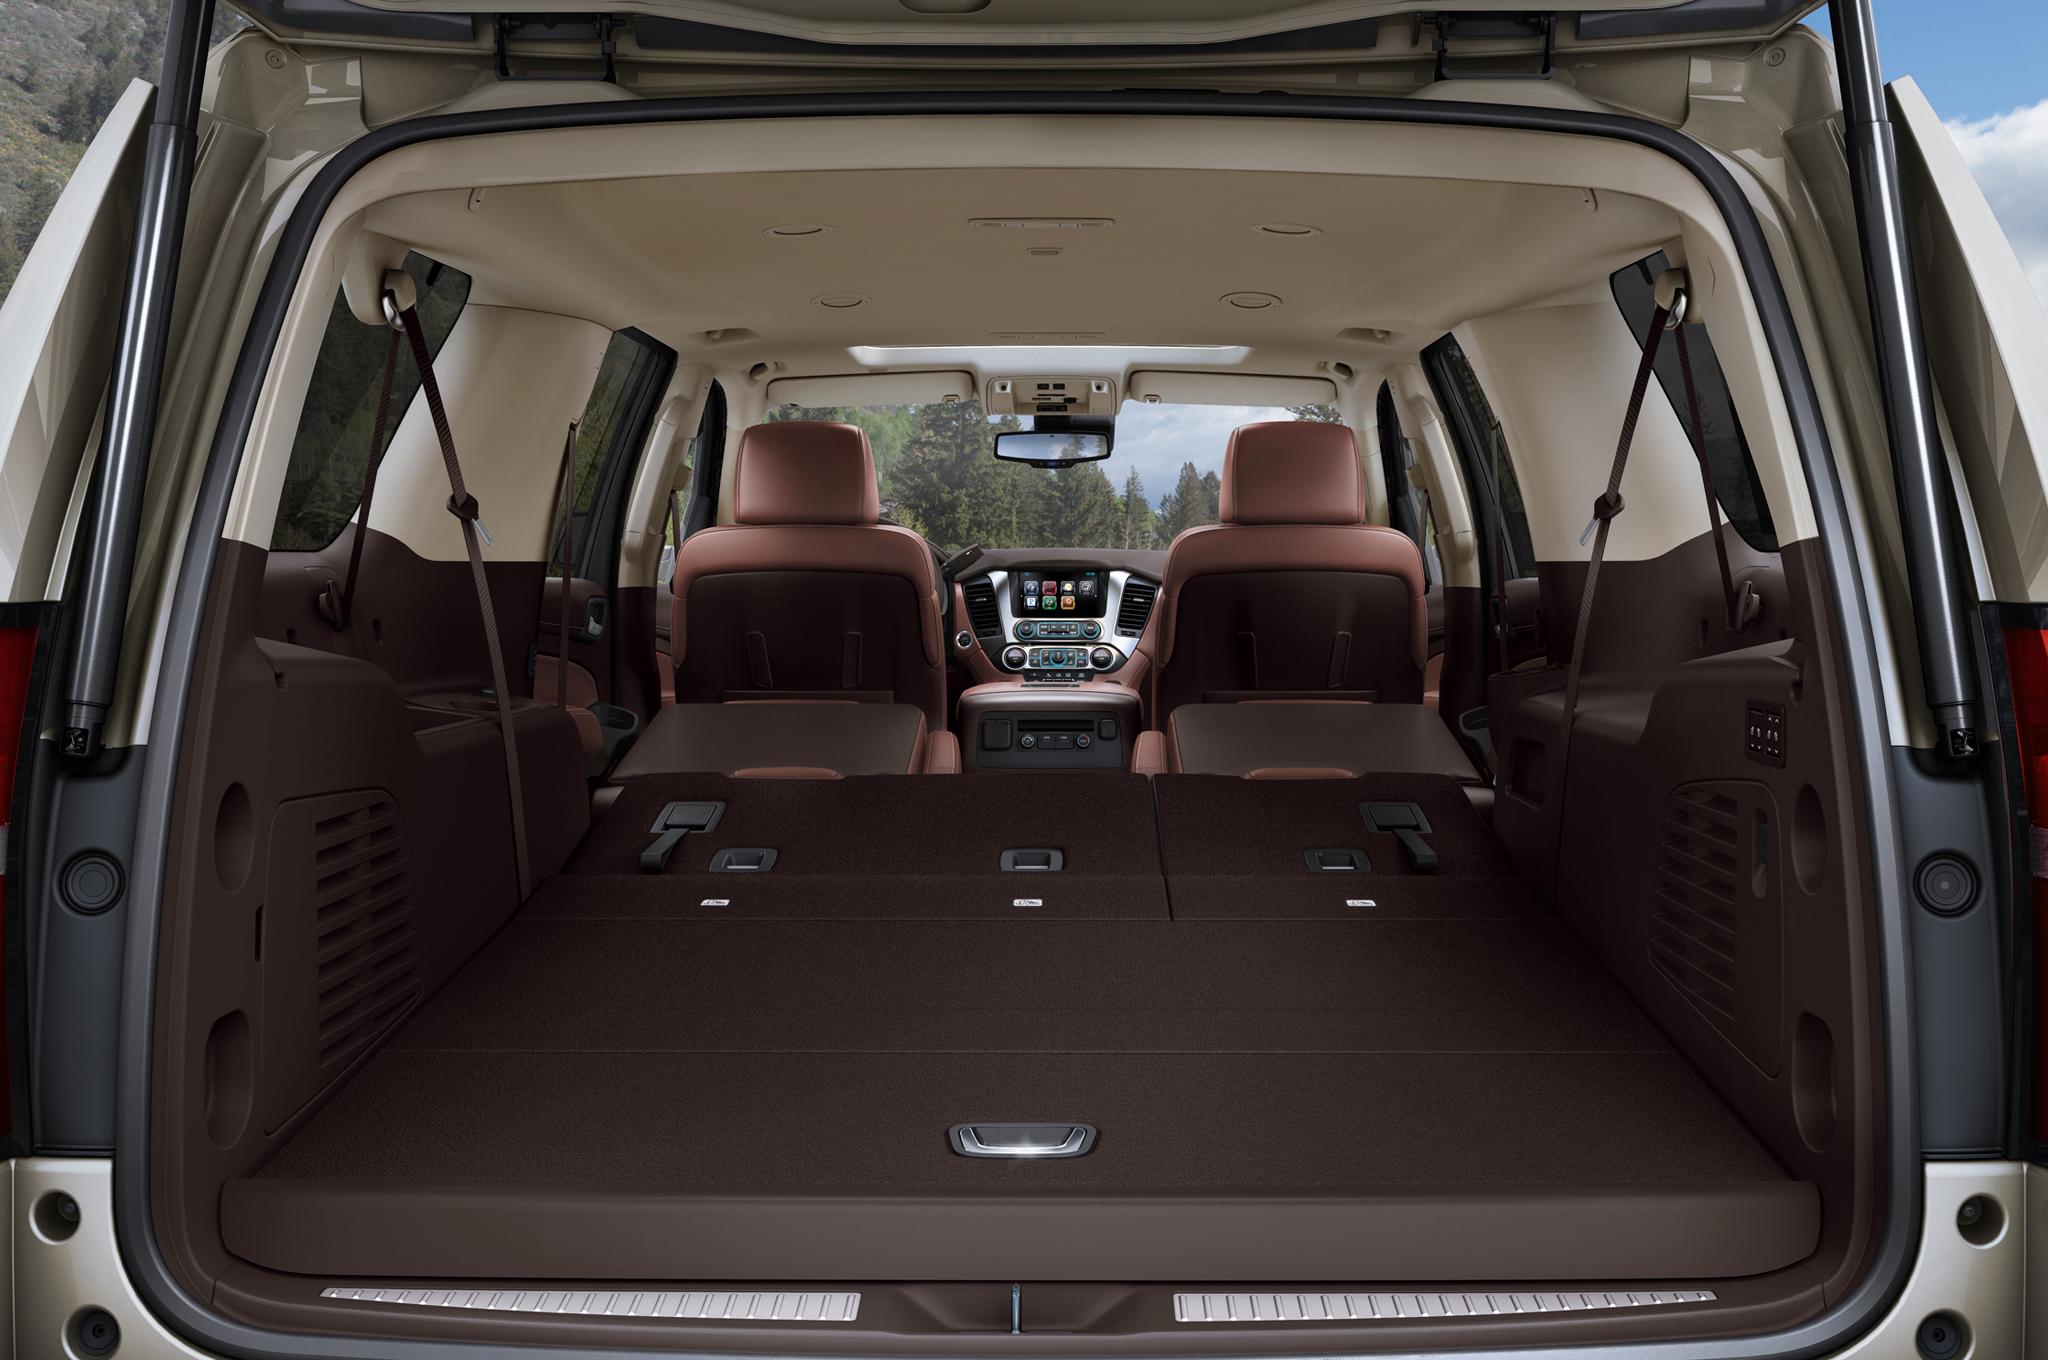 2015 Chevrolet Suburban Interior